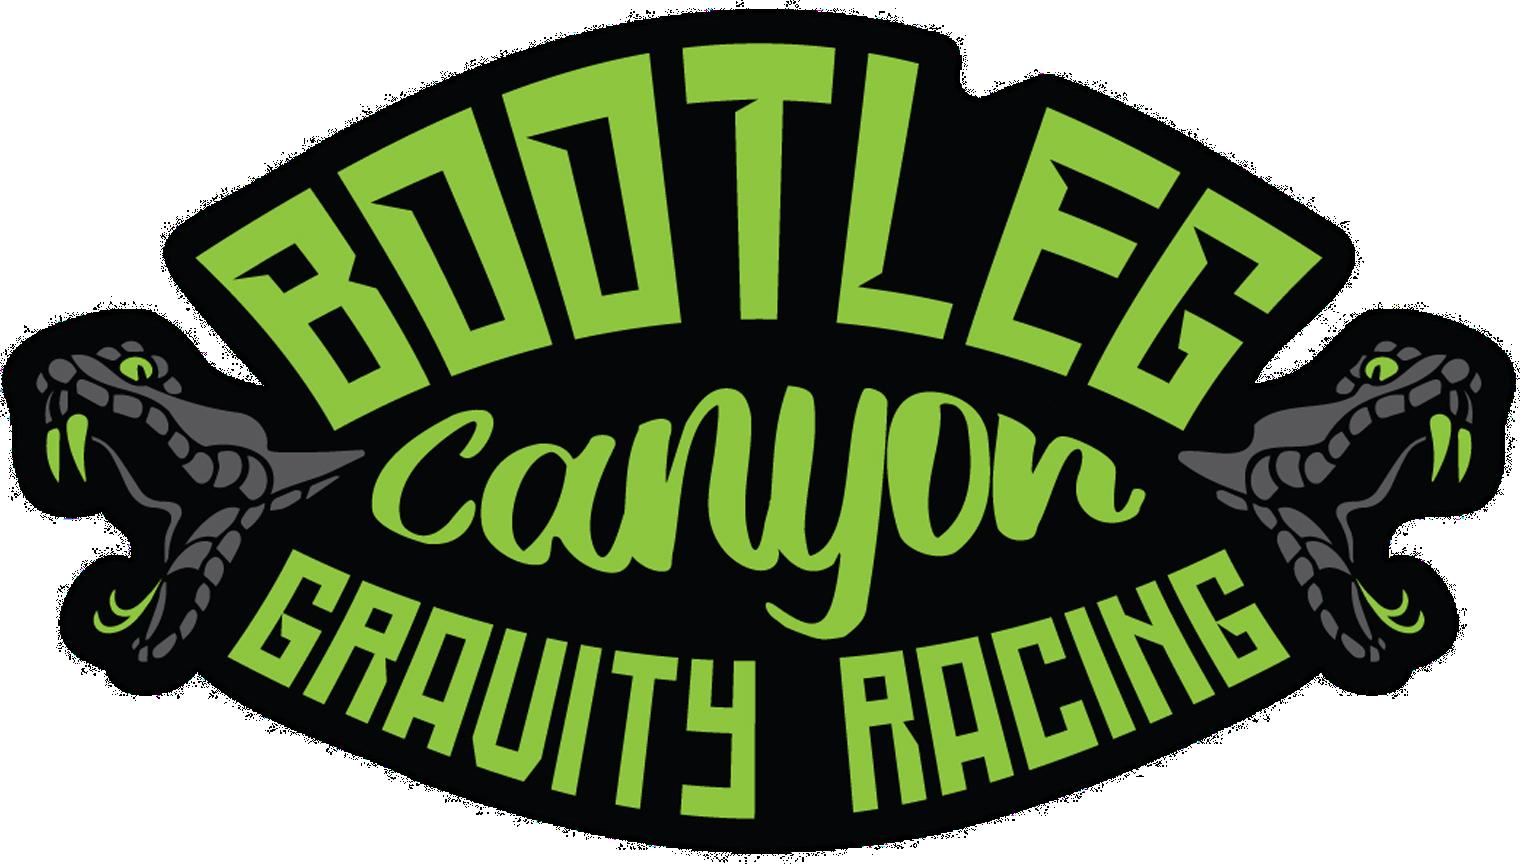 Bootleg Canyon Gravity Racing